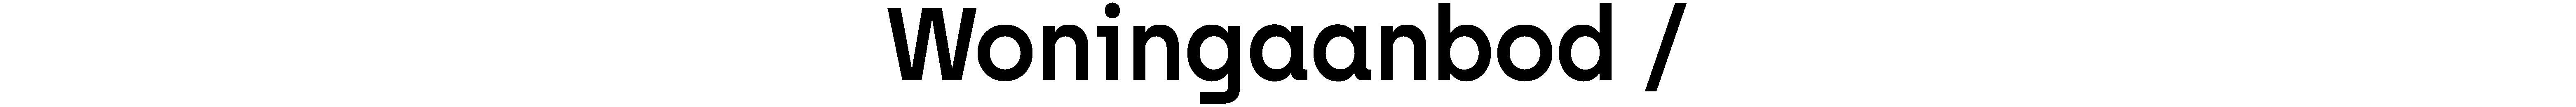 c0204a10-1abf-11eb-a856-83e1189fc9bf.png